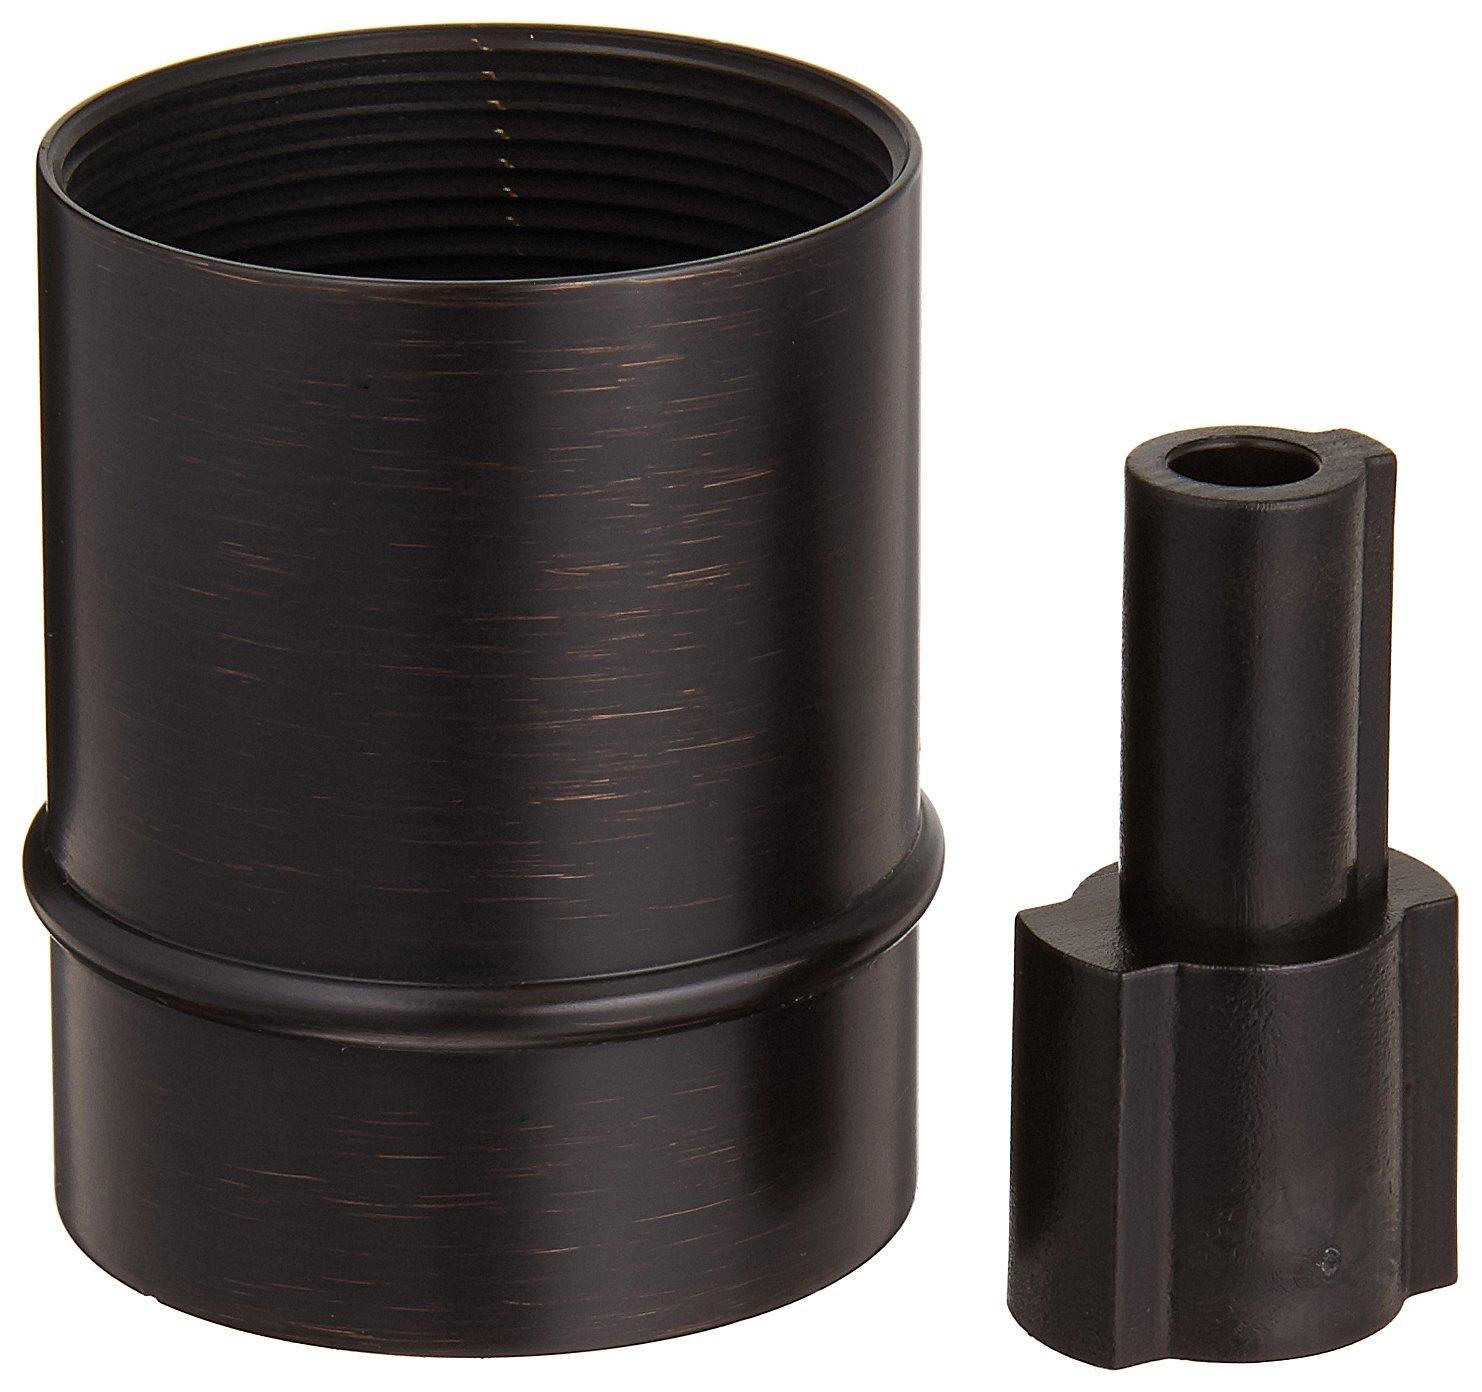 Pfister 910563Y Replacement Part - Faucet Extension Tubes - Amazon.com